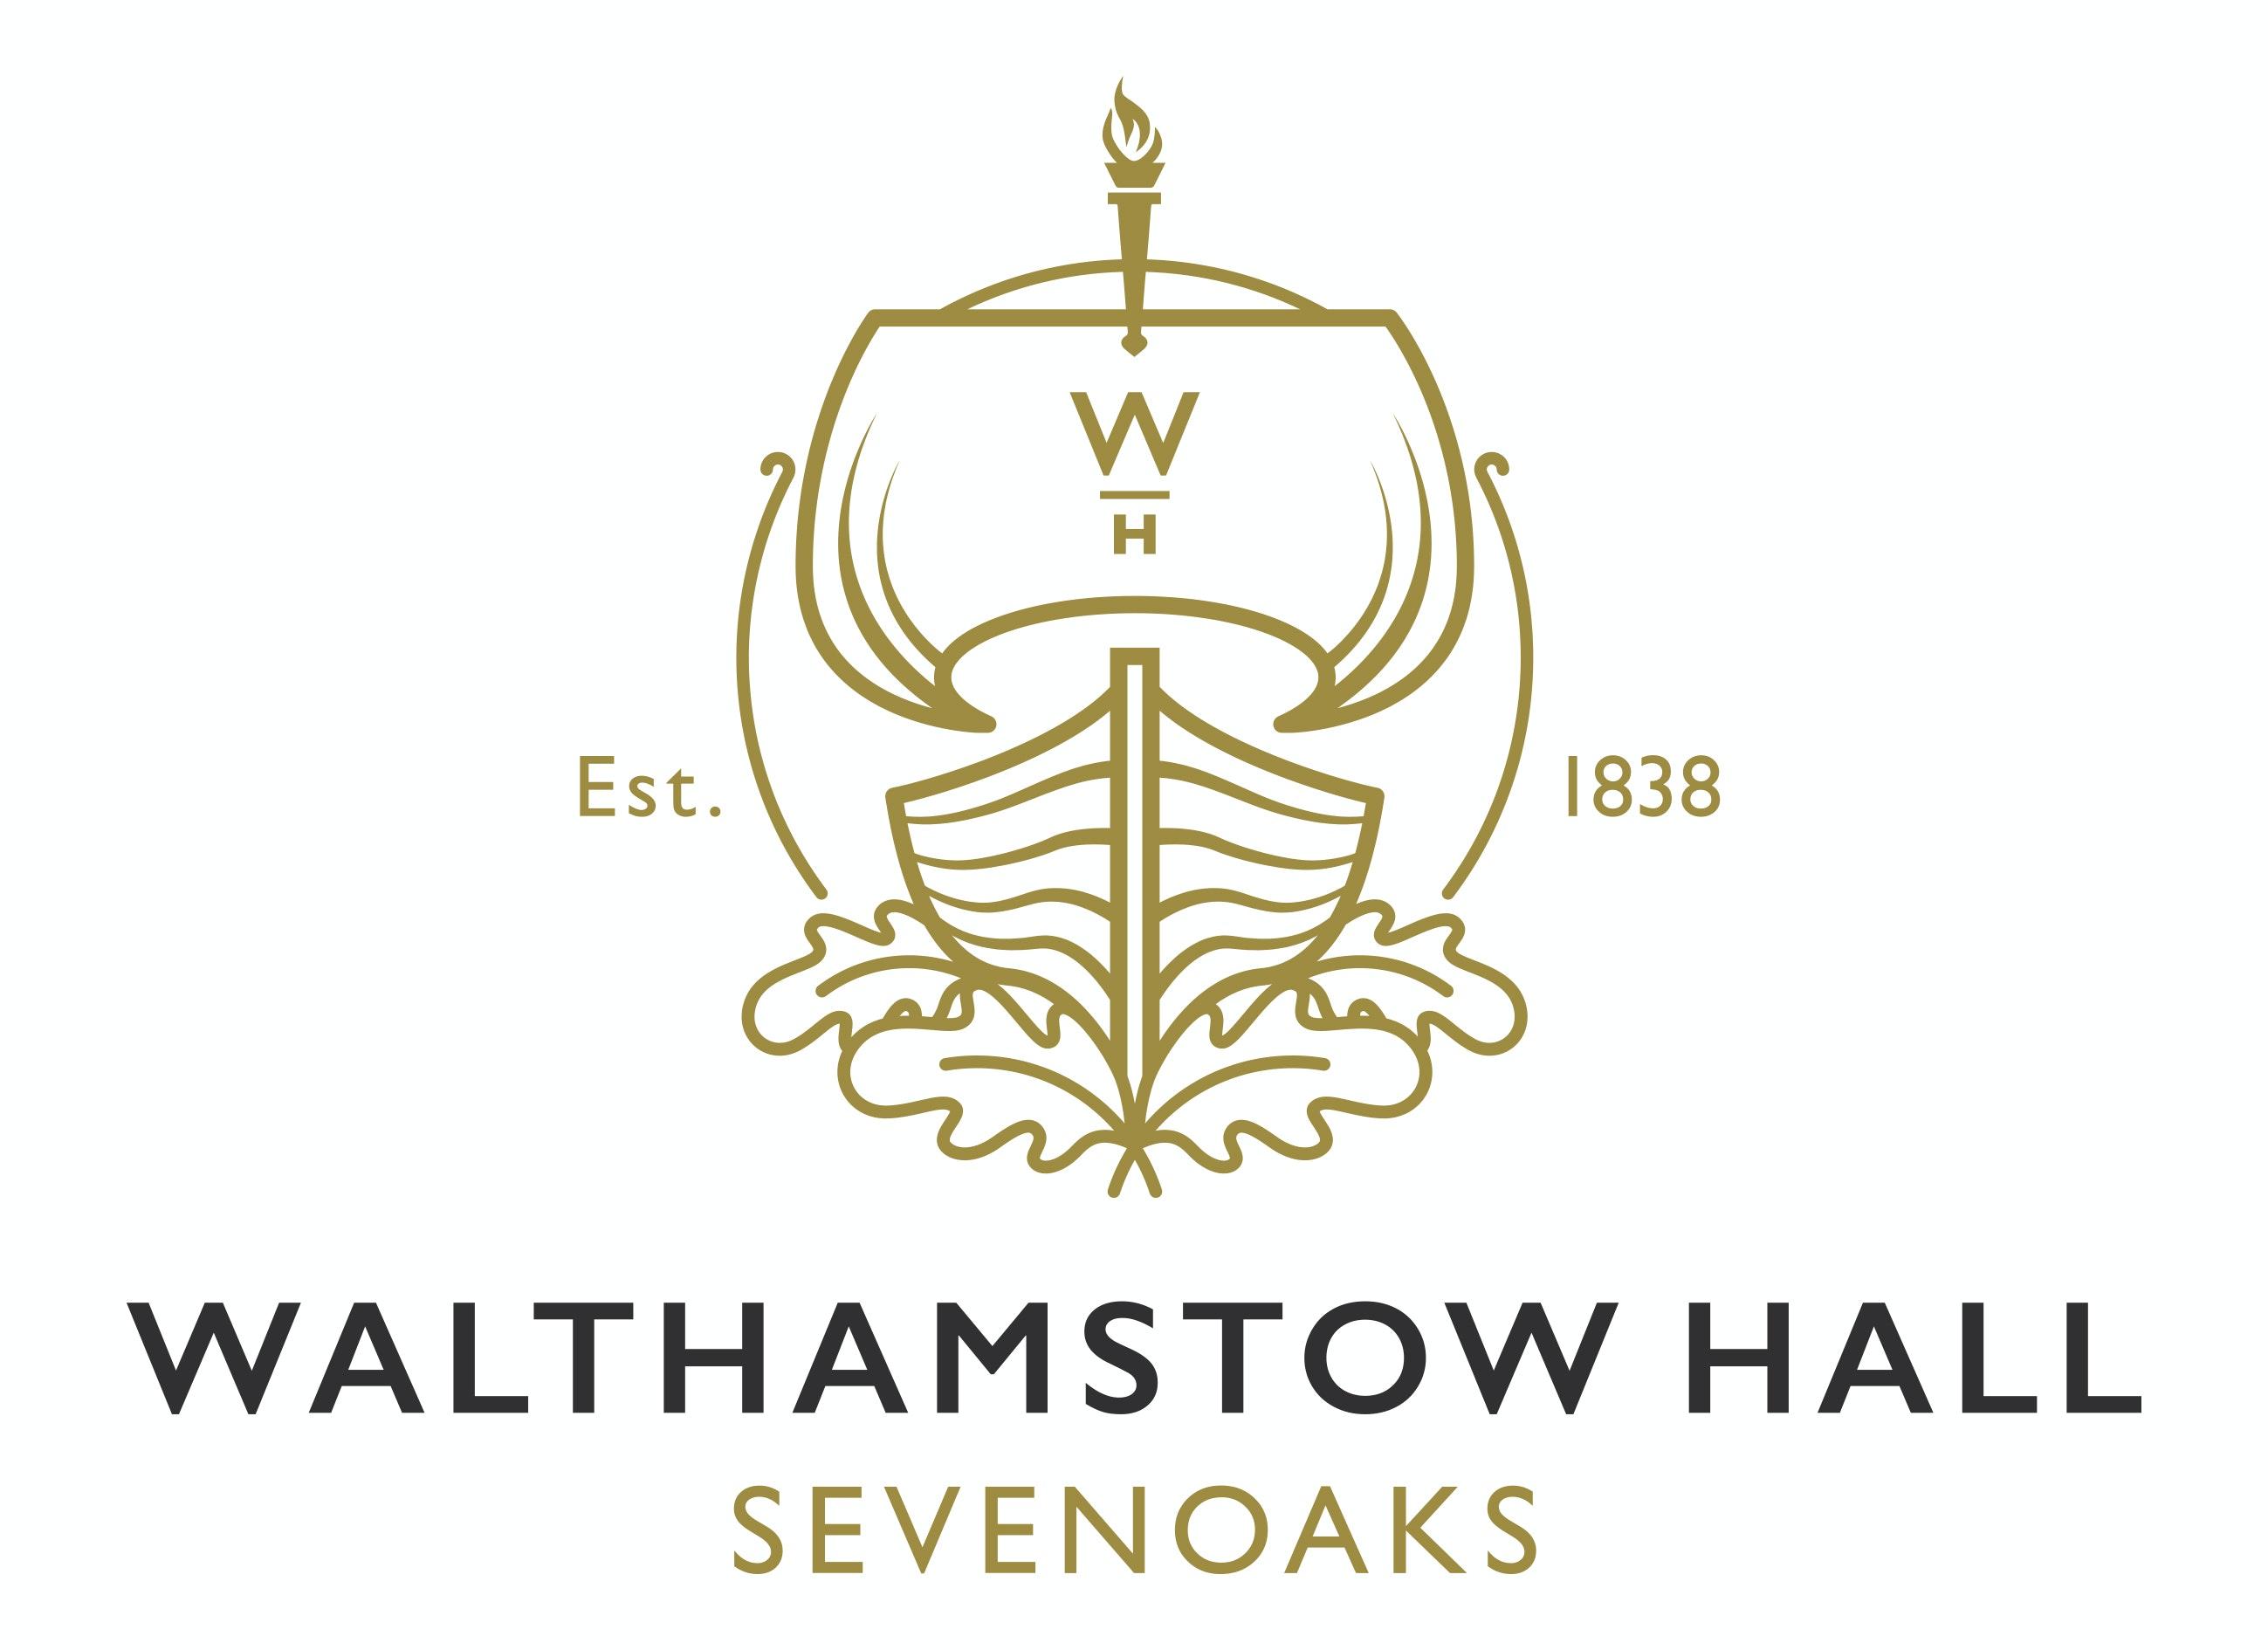 Walthamstow Hall Senior School Open Morning -  Thursday 7 March 2019